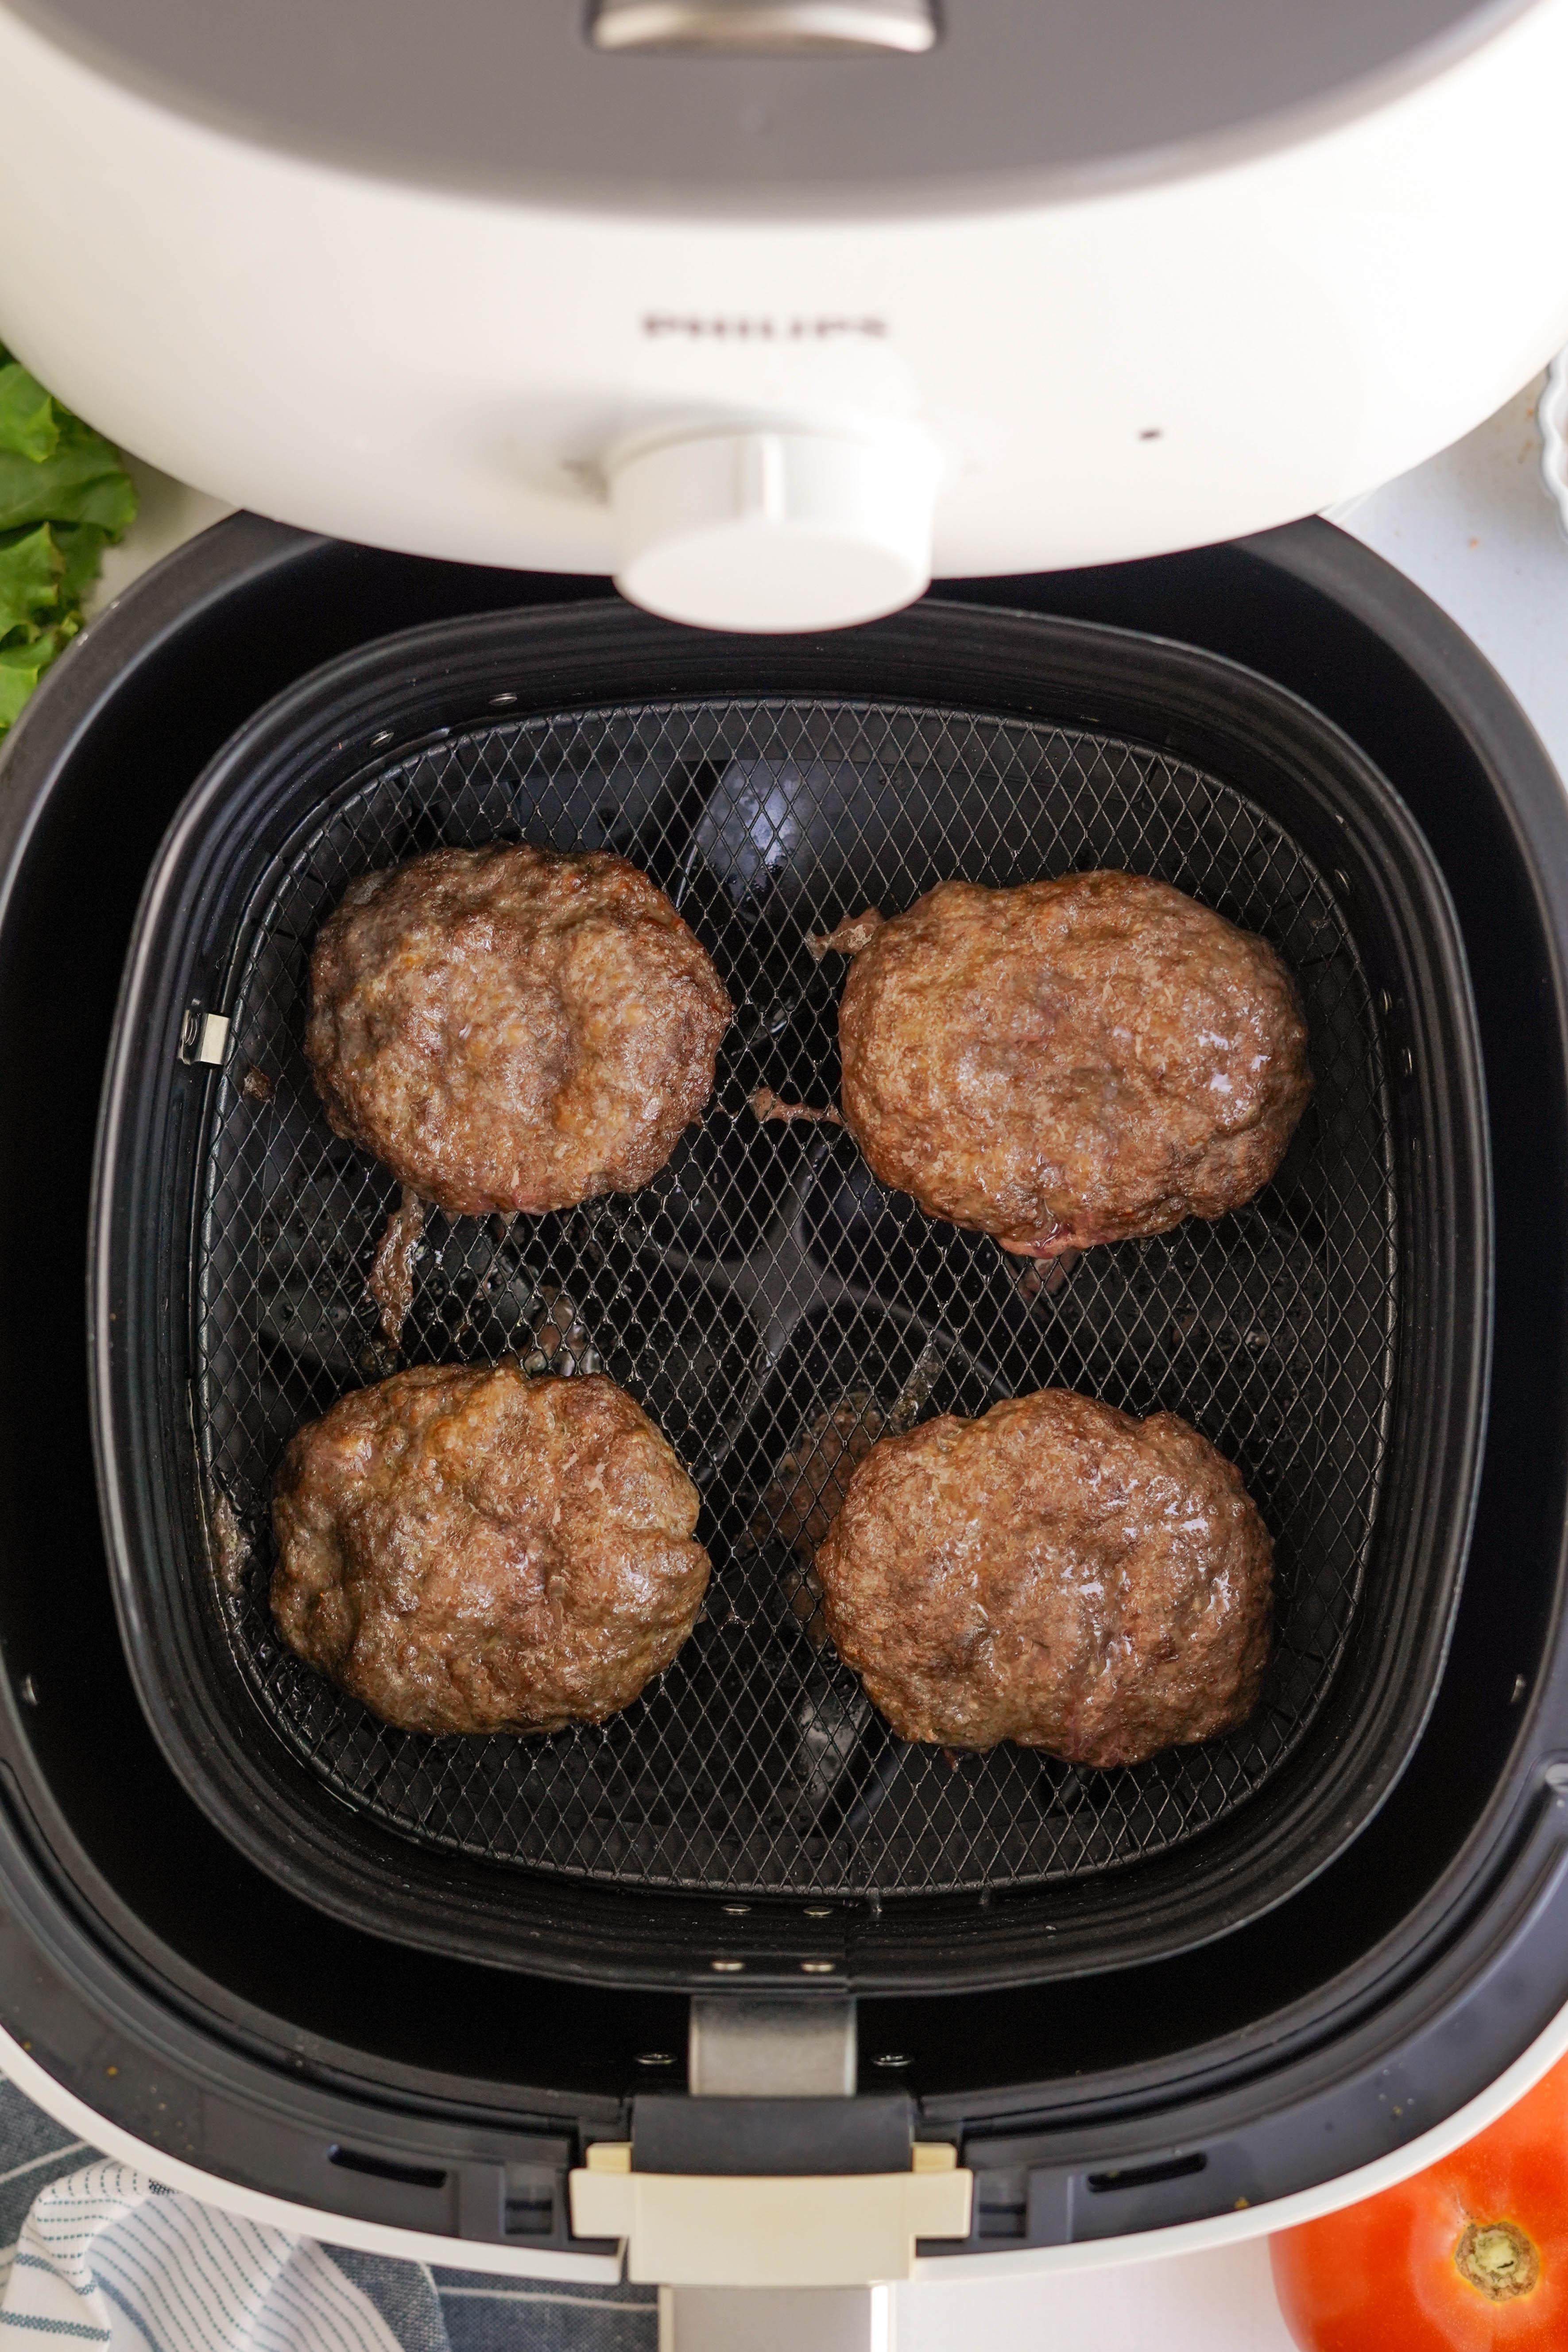 cooked hamburgers in air fryer basket